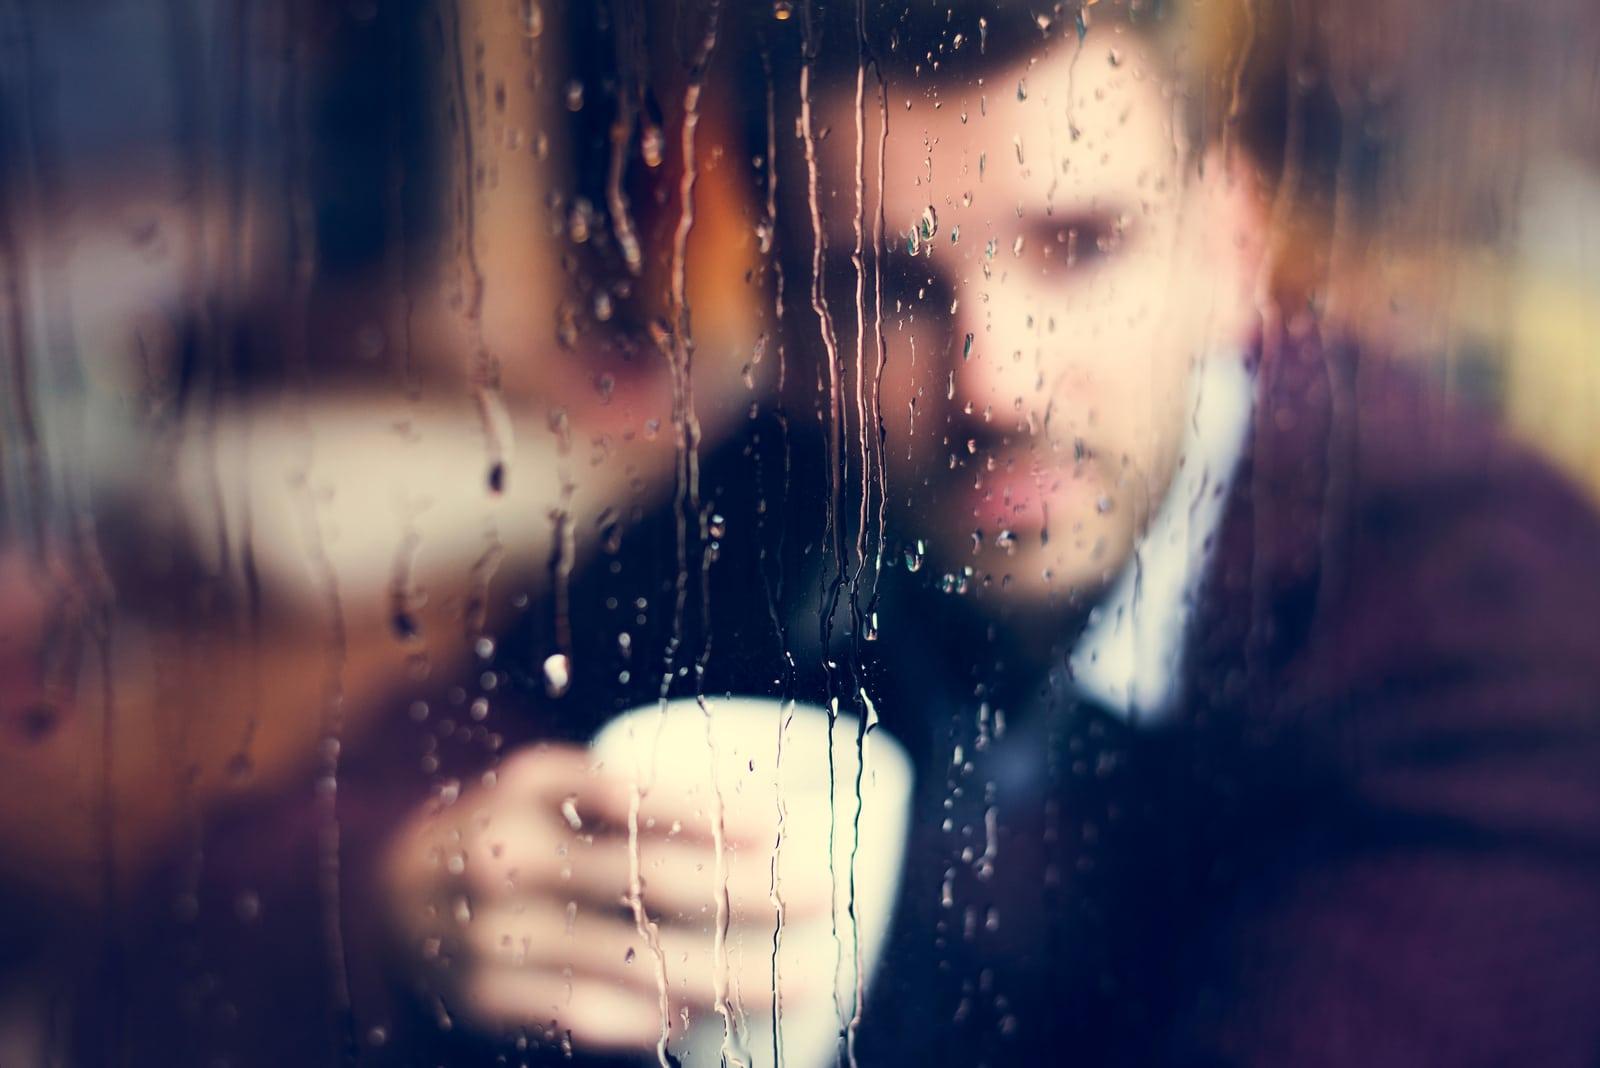 a man drinks coffee